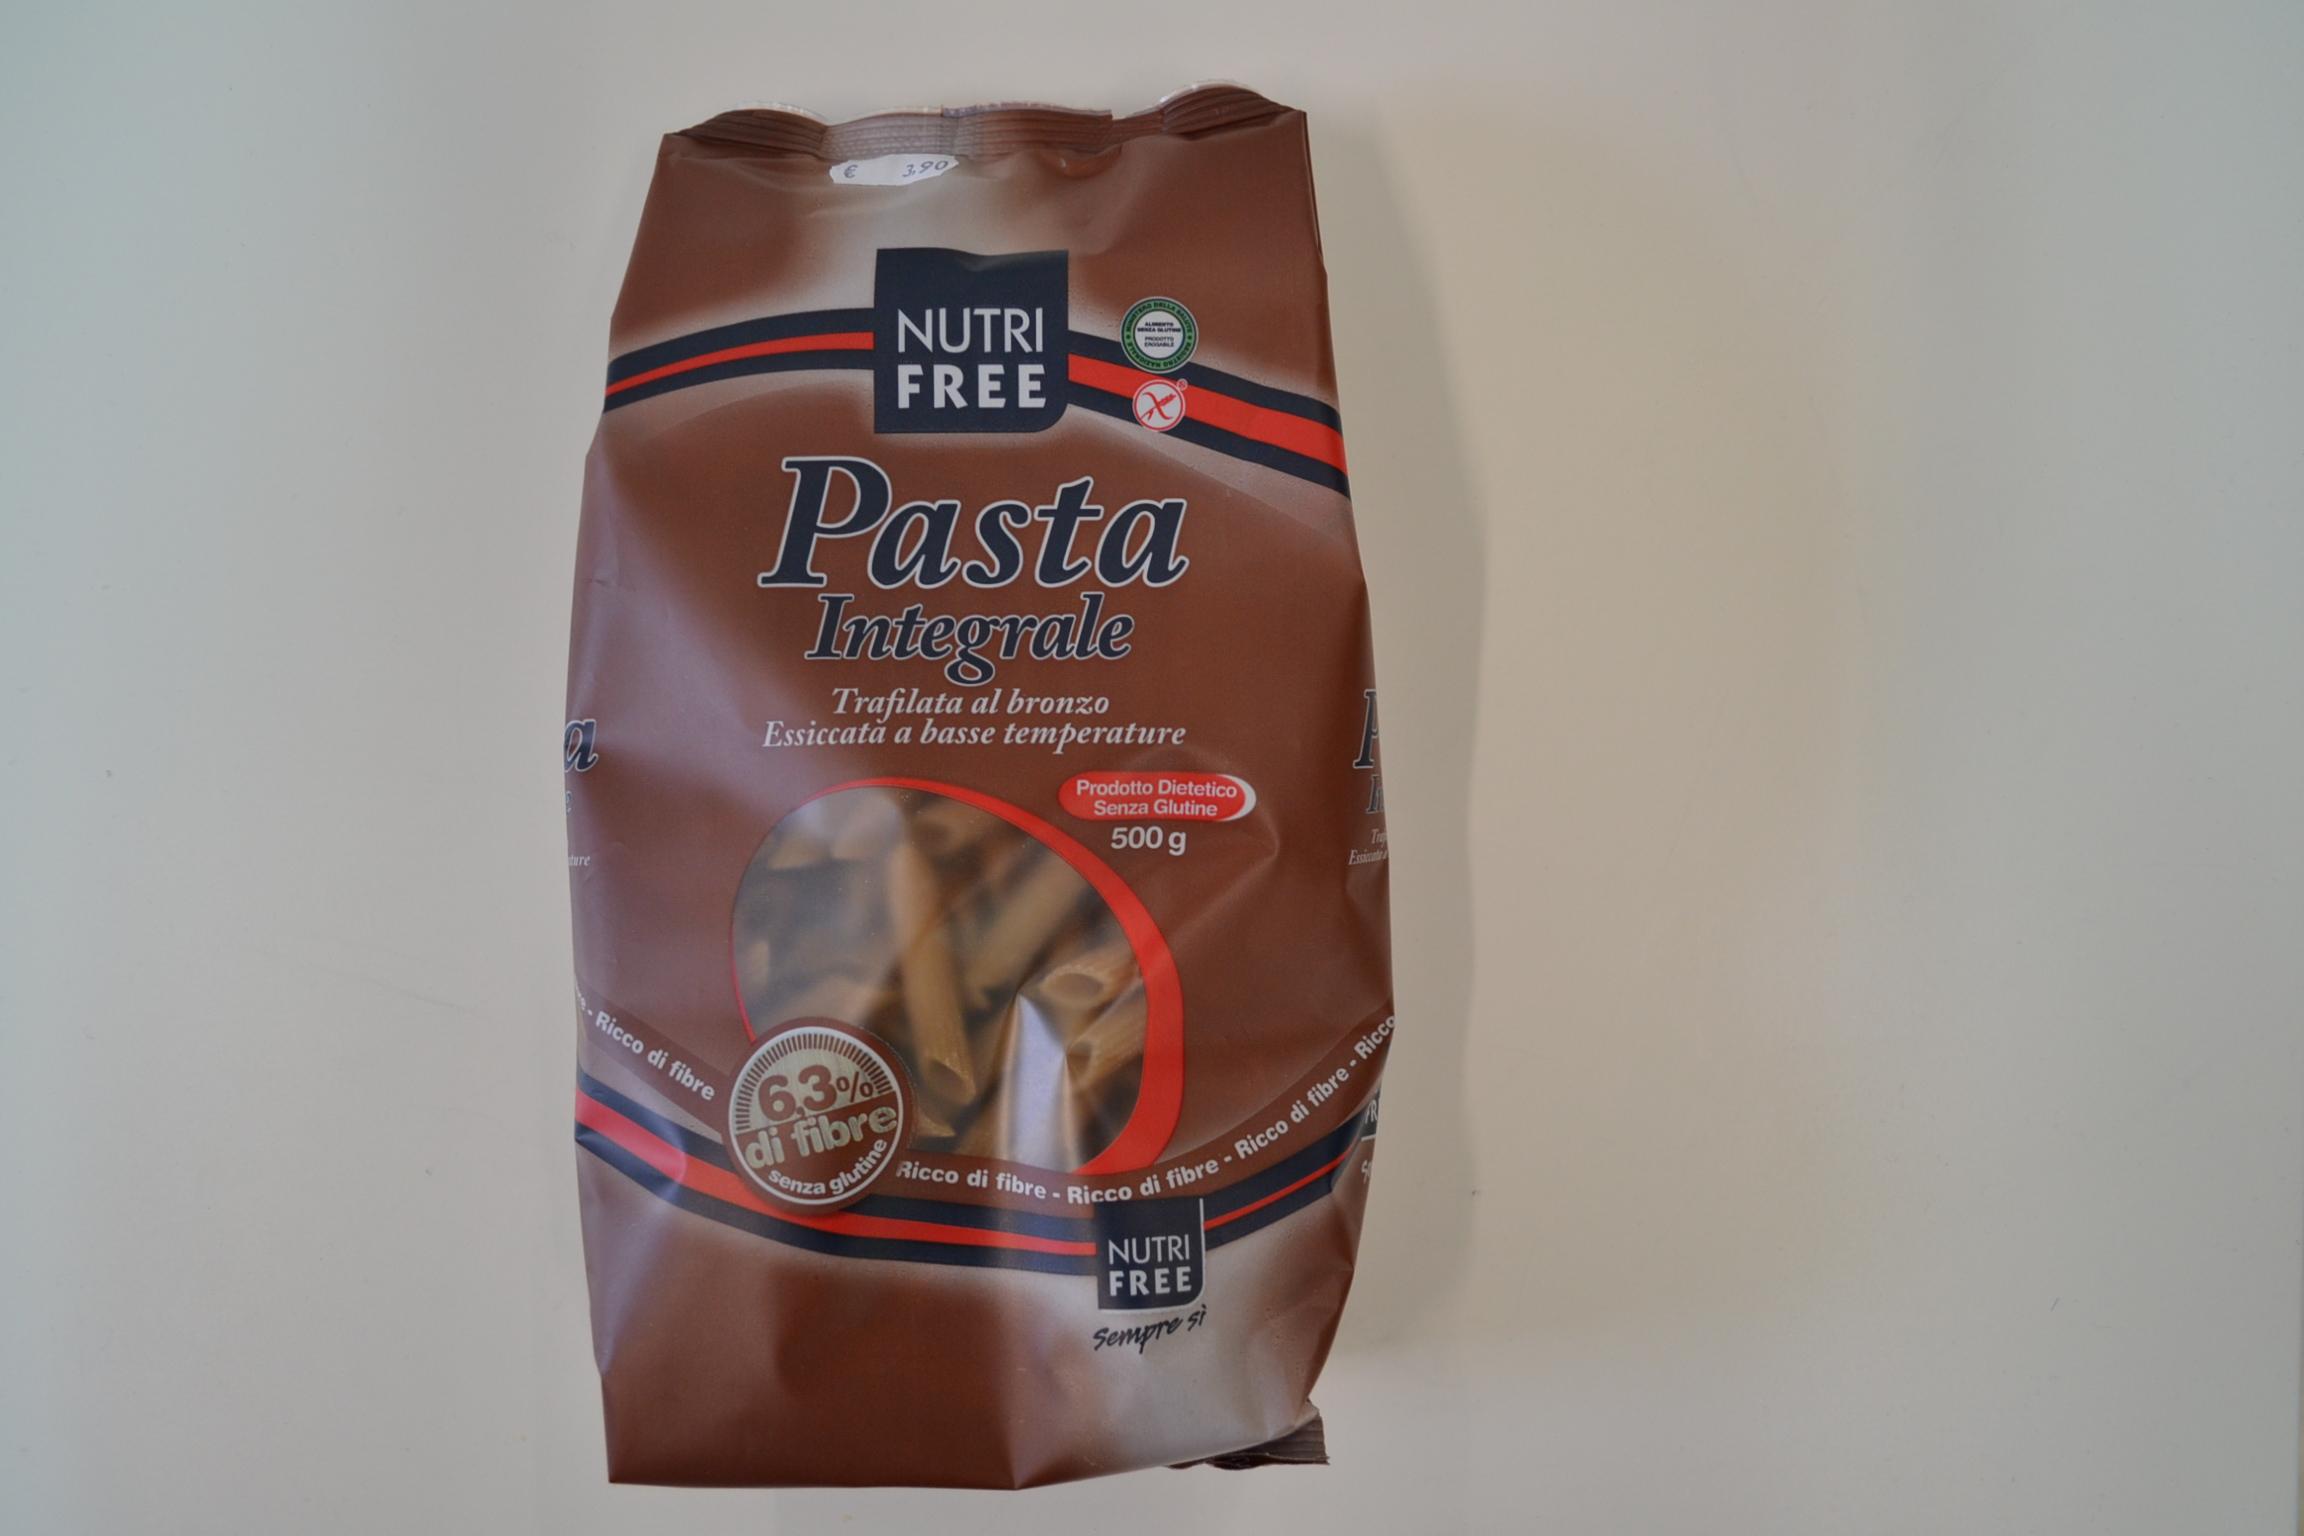 Pasta integrale Penne NUTRI FREE € 3,90